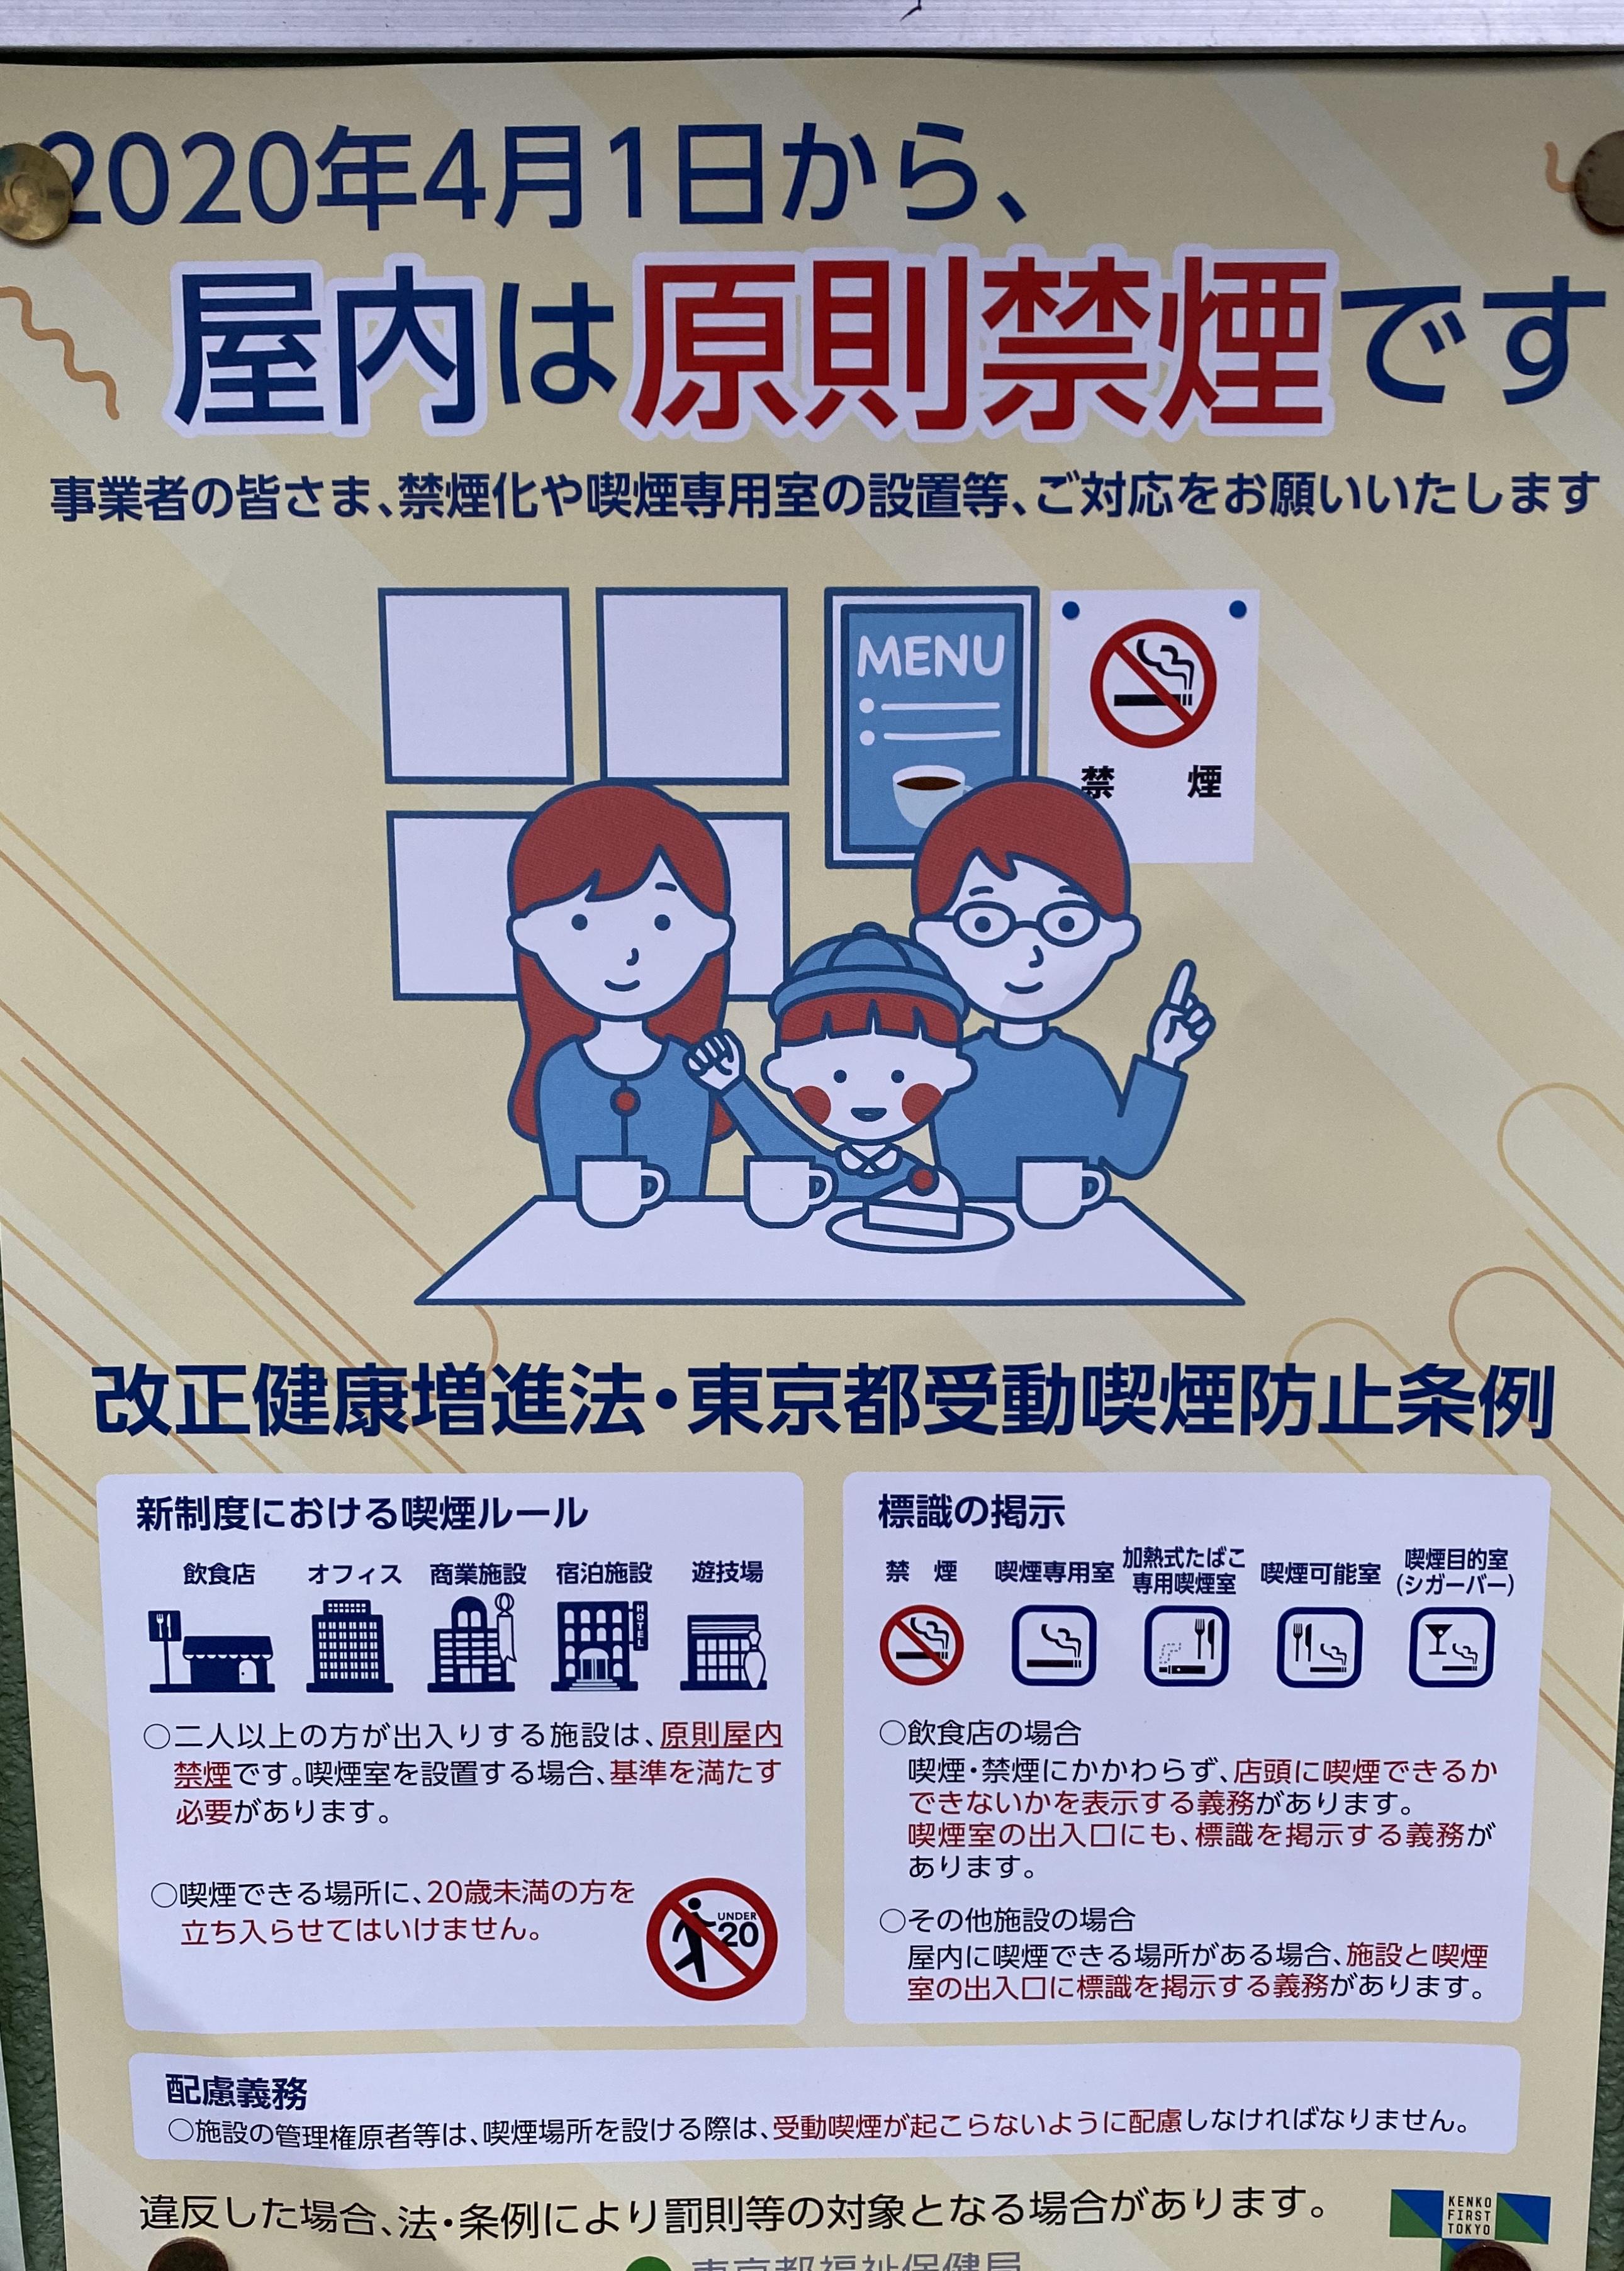 Tokyo bans smoking poster